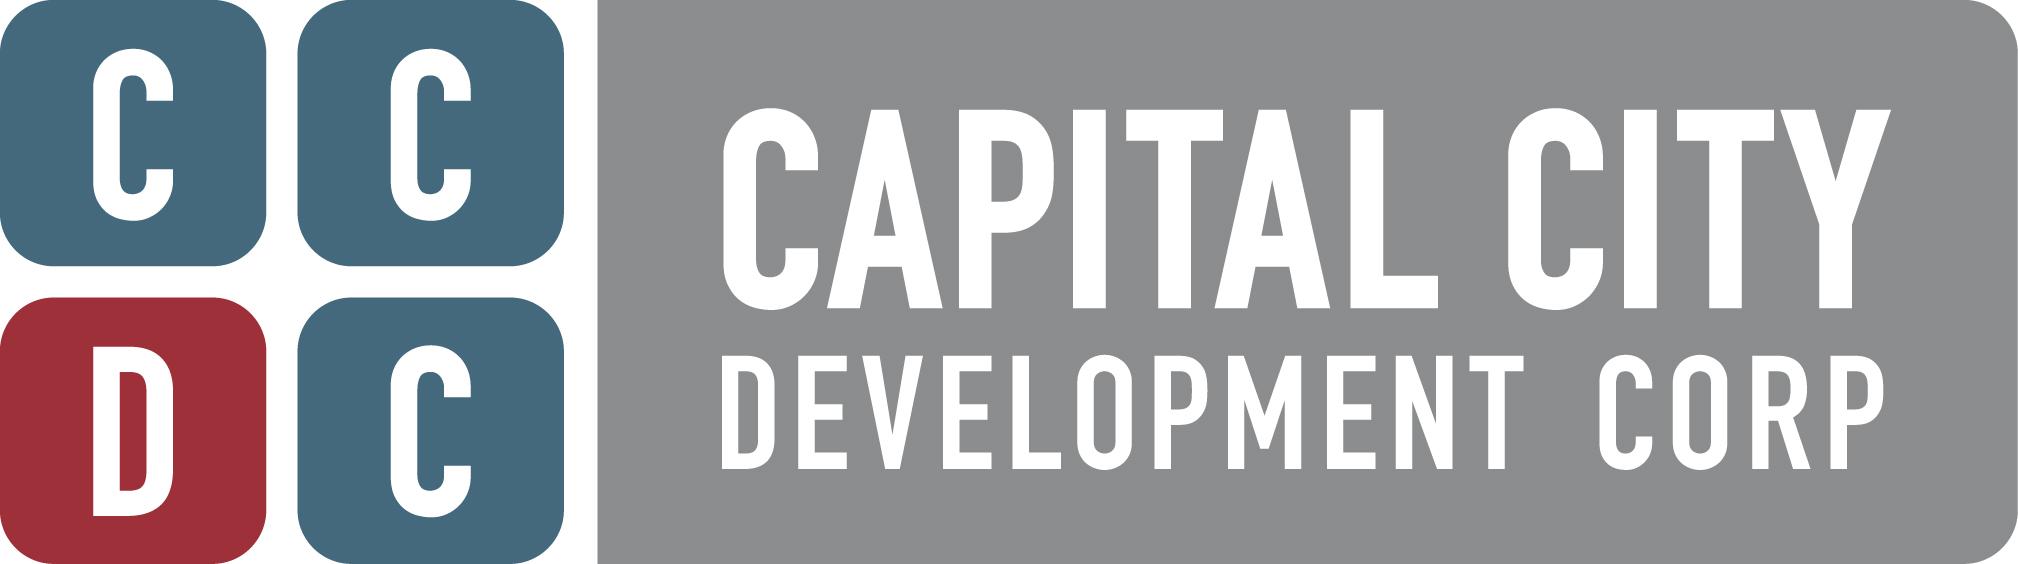 Capital City Development Corporation (CCDC)